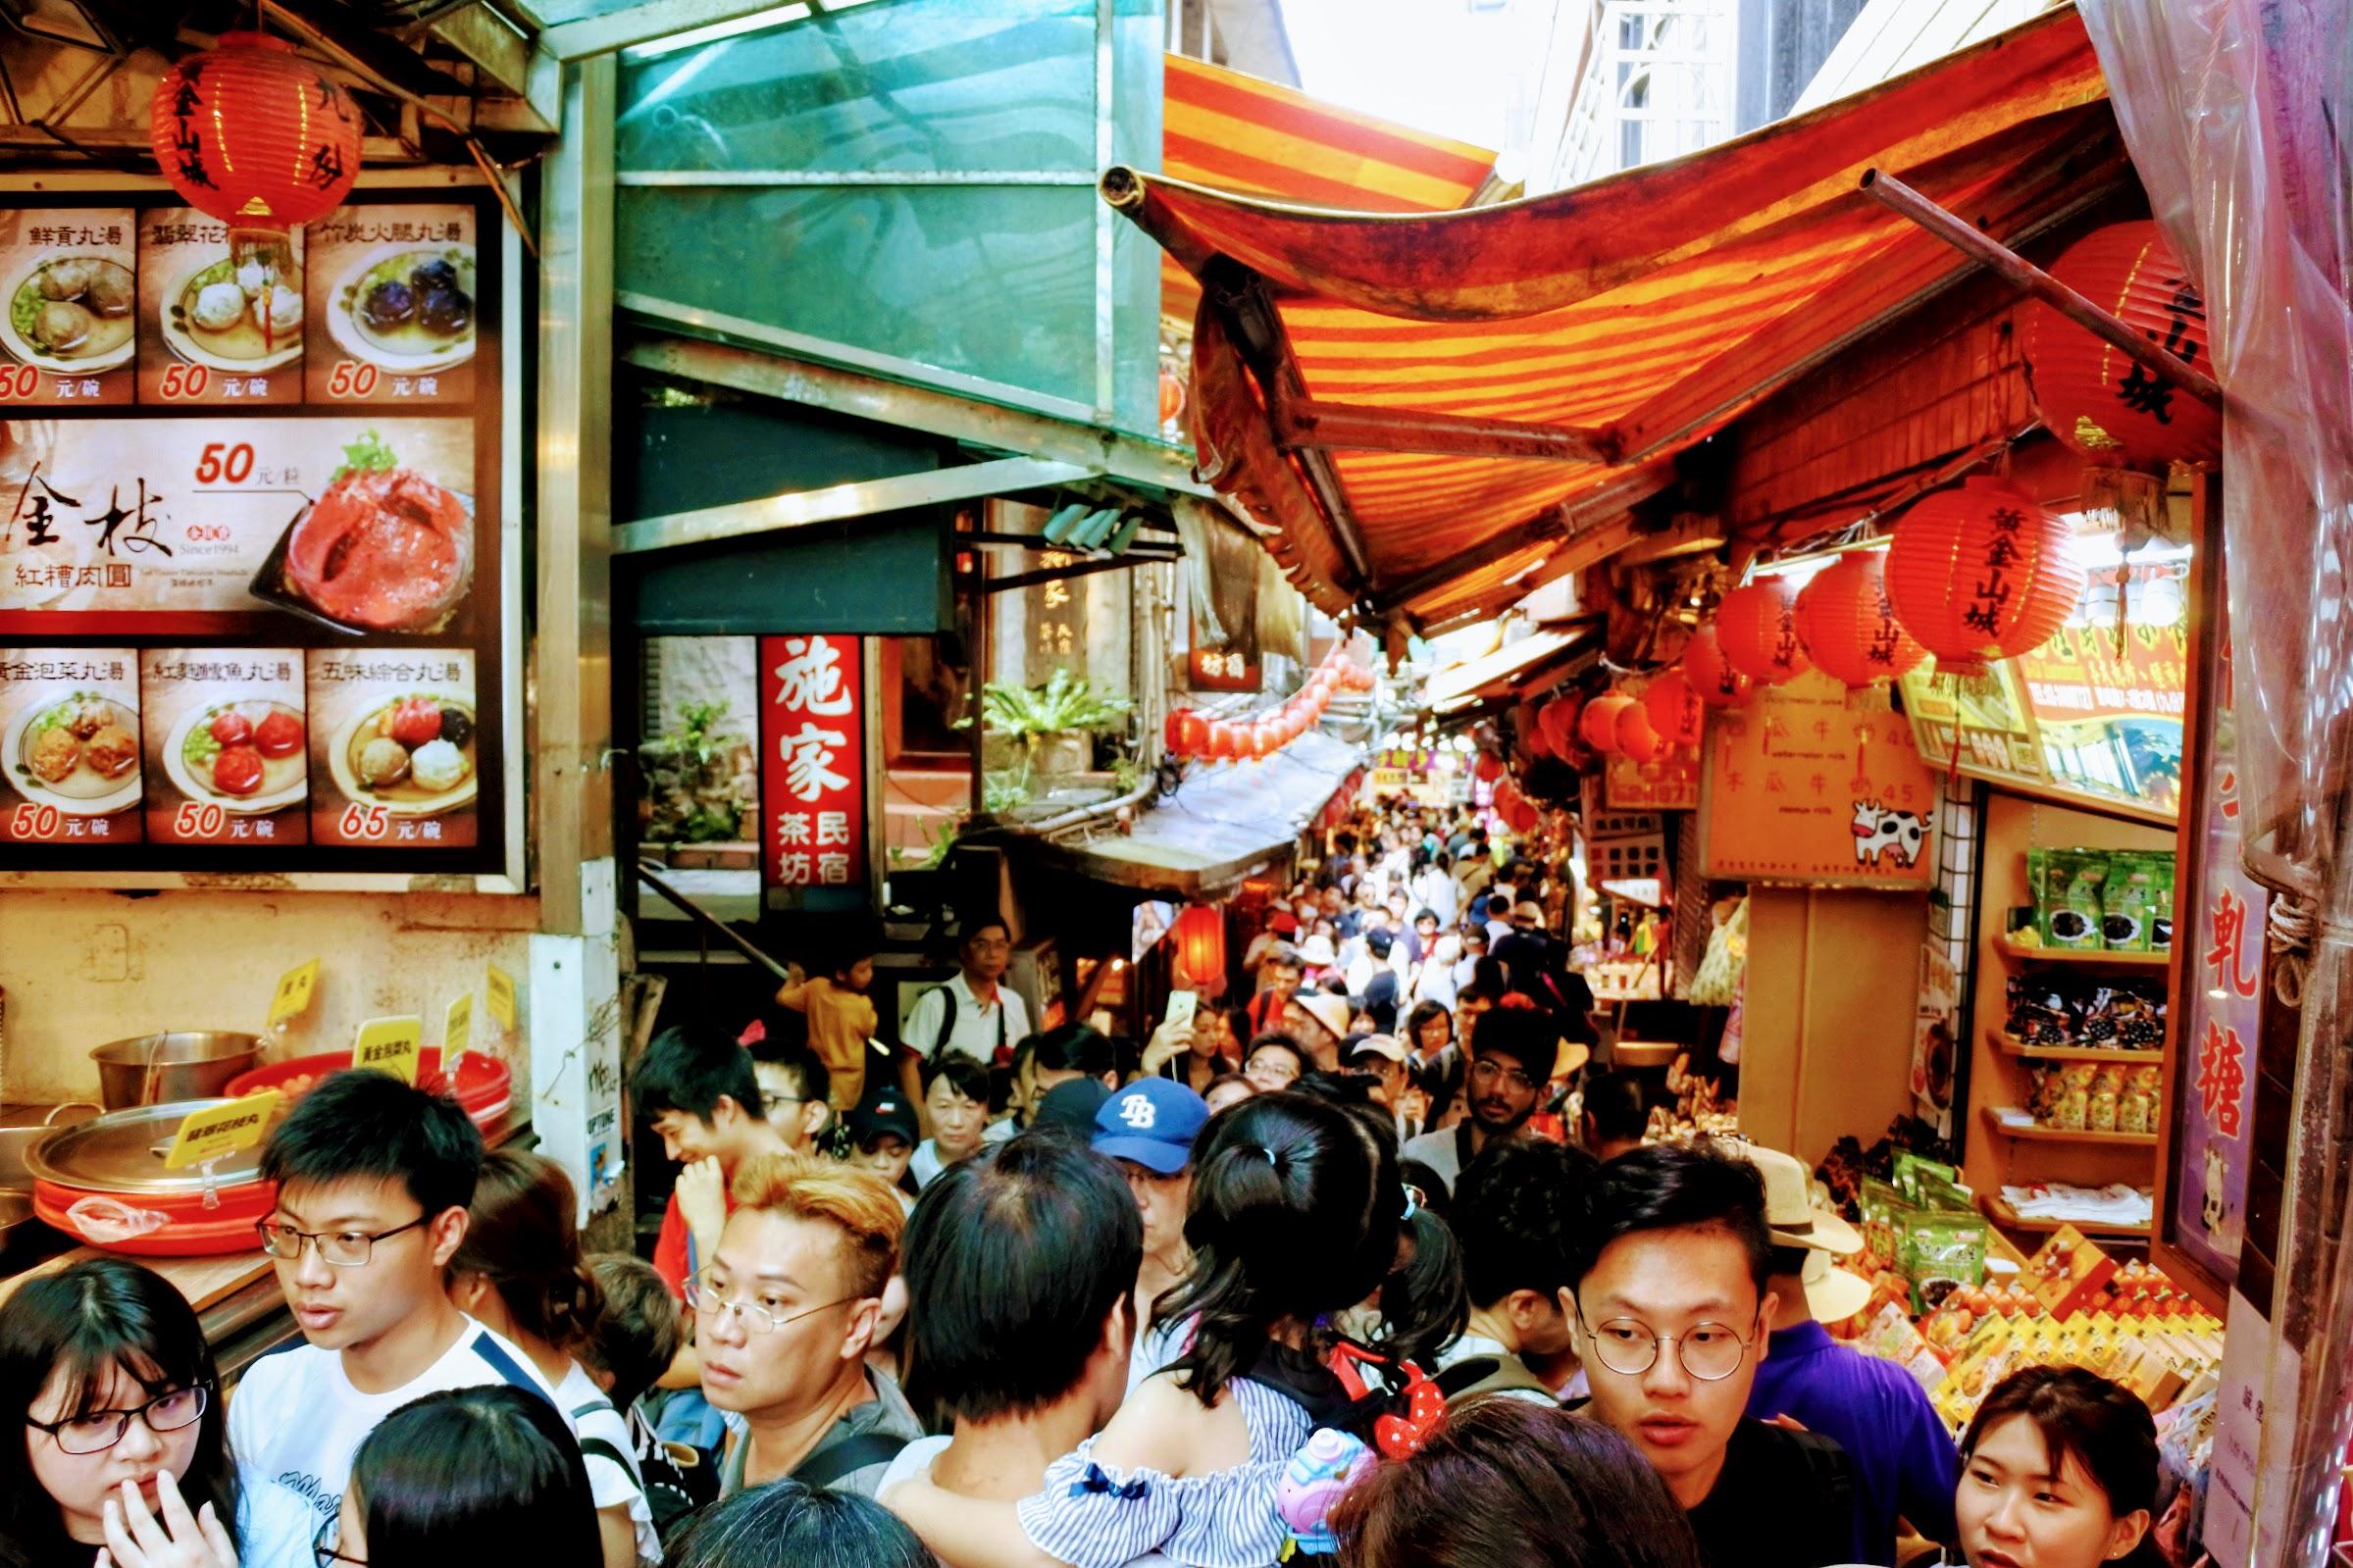 Jiu Fen Old Street swarming with people